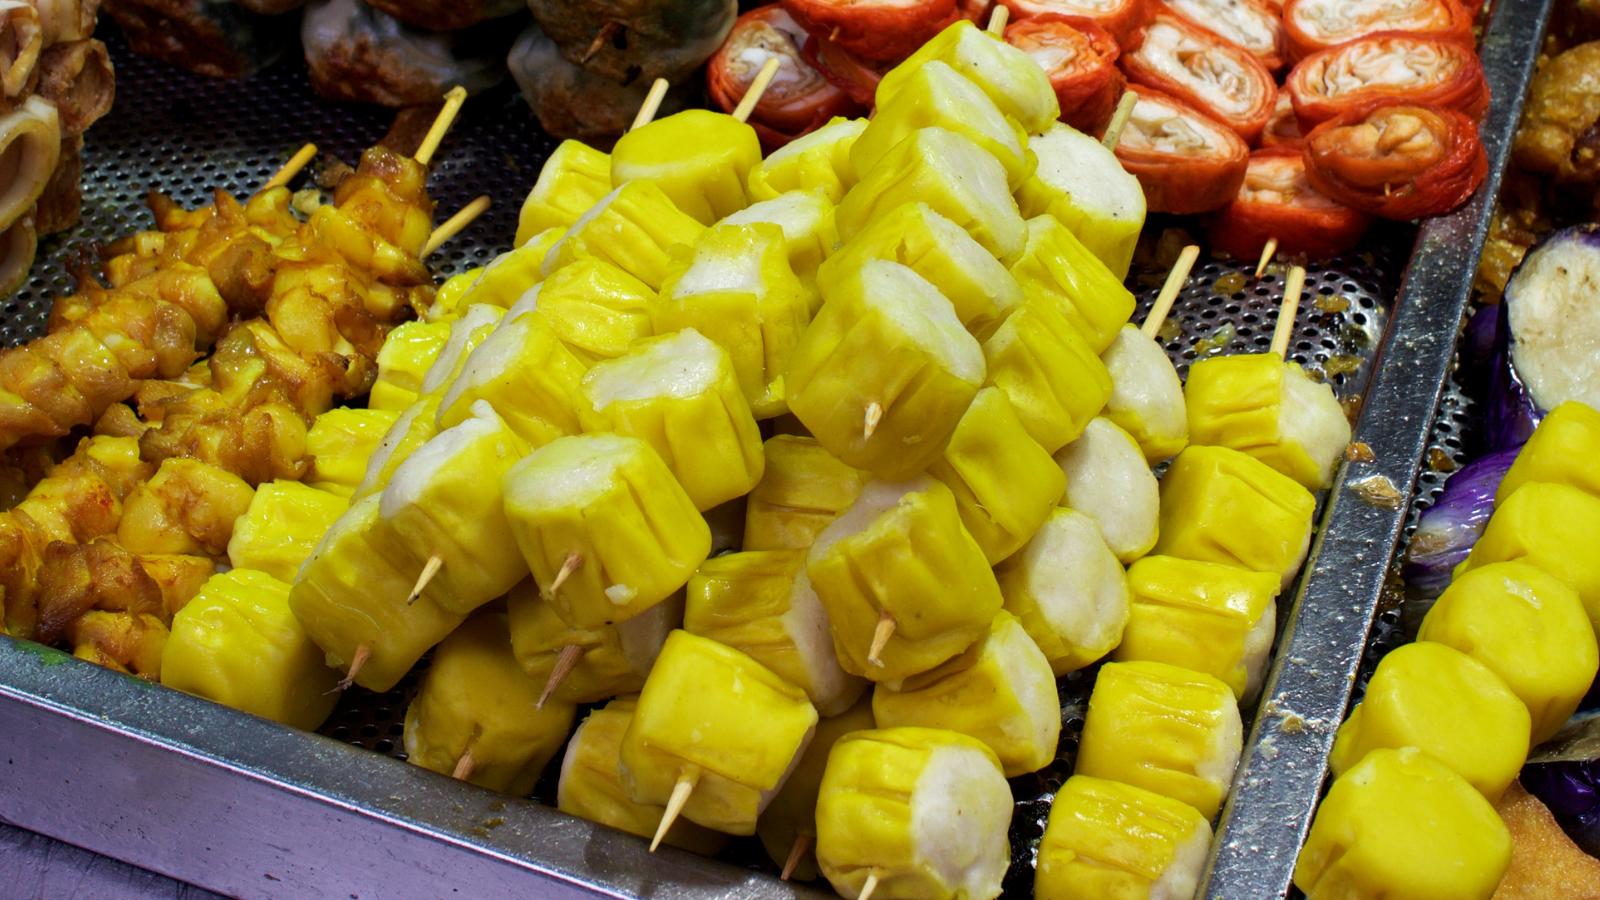 Siu Mai street food in Hong Kong.